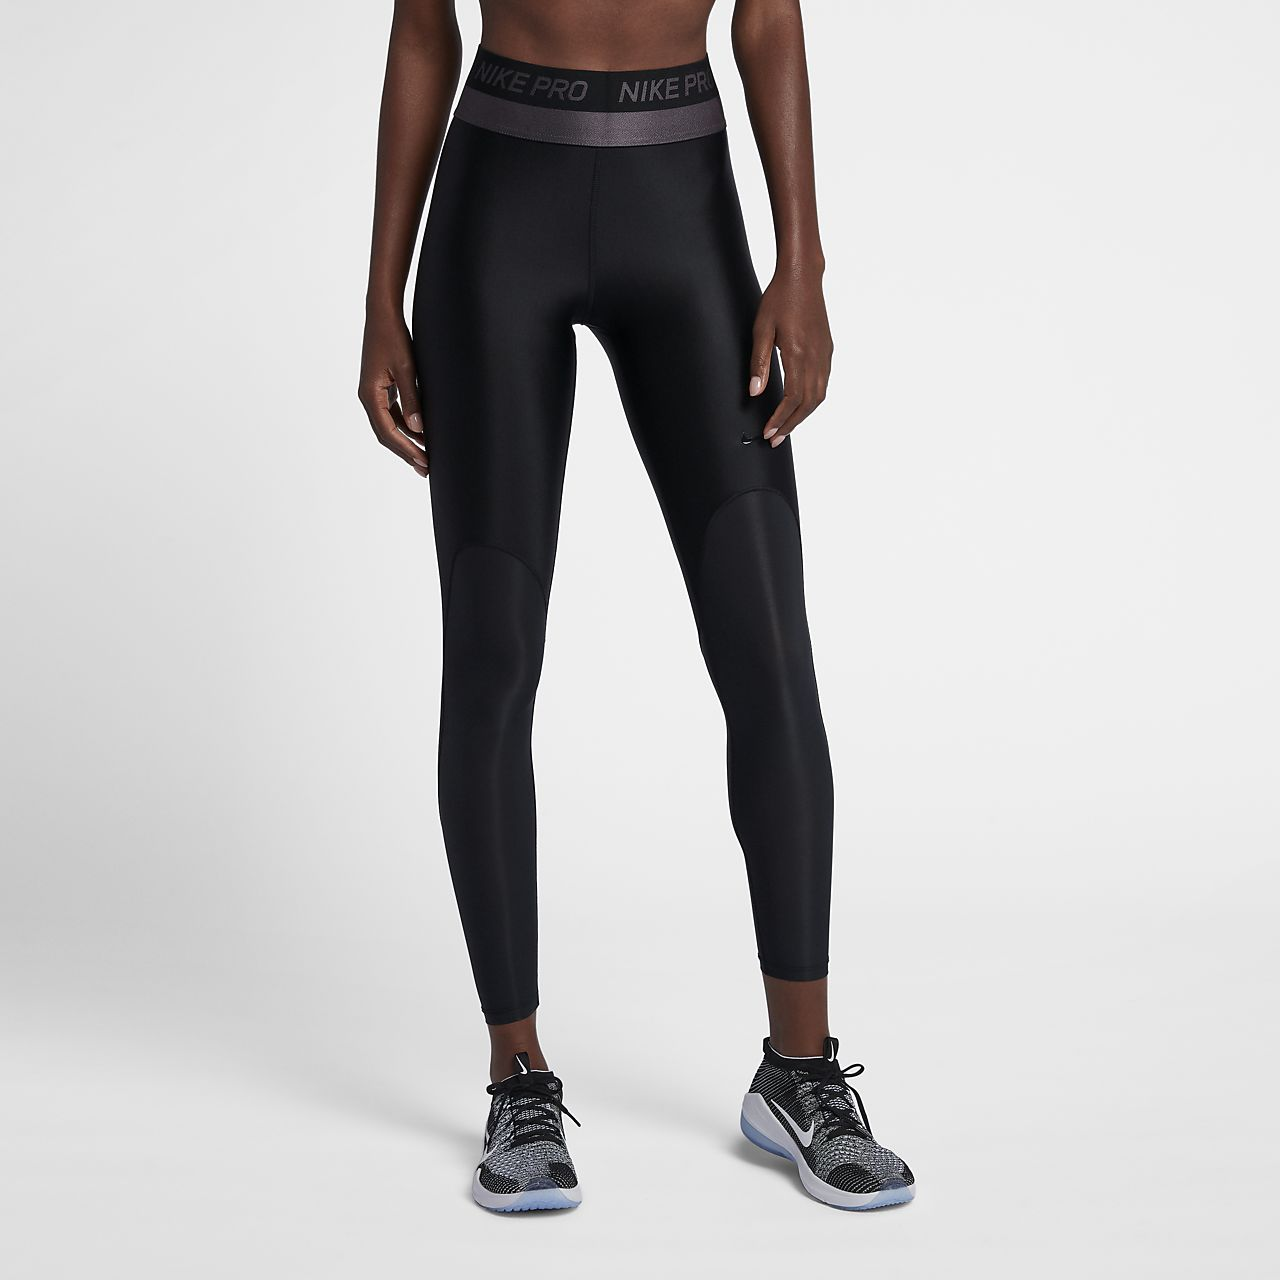 Nike Pro HyperCool Women's Mid-Rise Training Tights